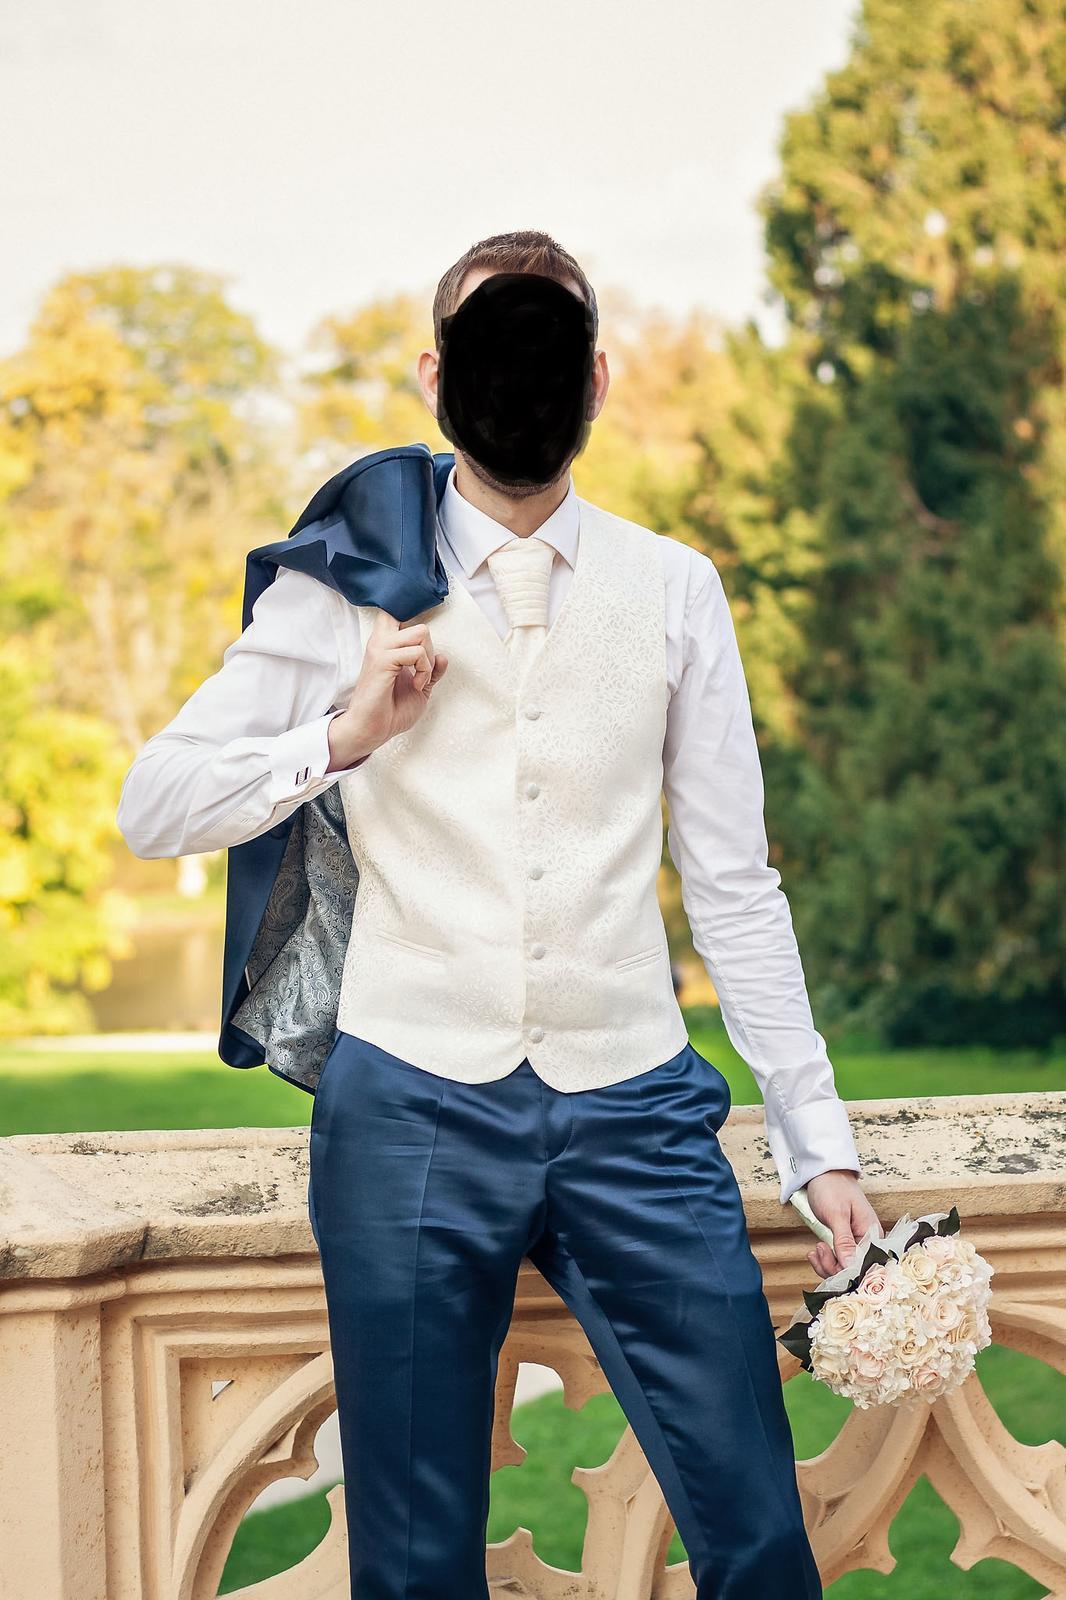 Pánsky svadobný oblek s košeľou - Obrázok č. 1